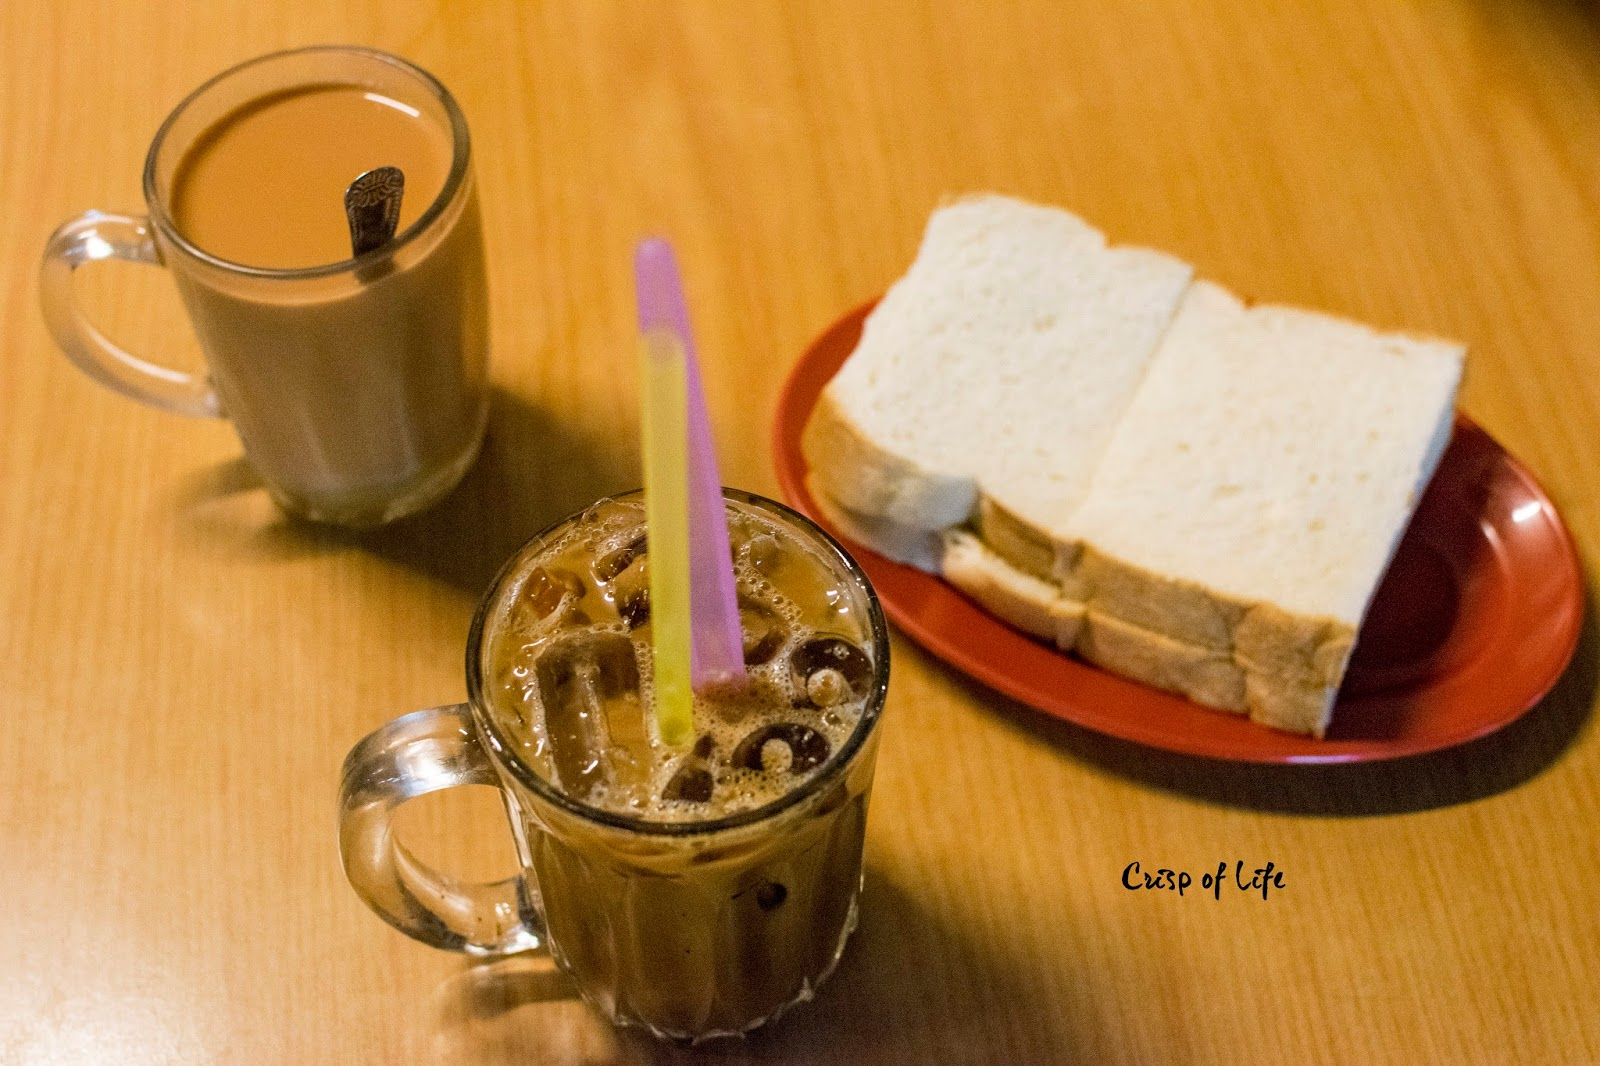 Kedai Kopi Fook Yuen Kota Kinabalu Sabah Roti Kahwin